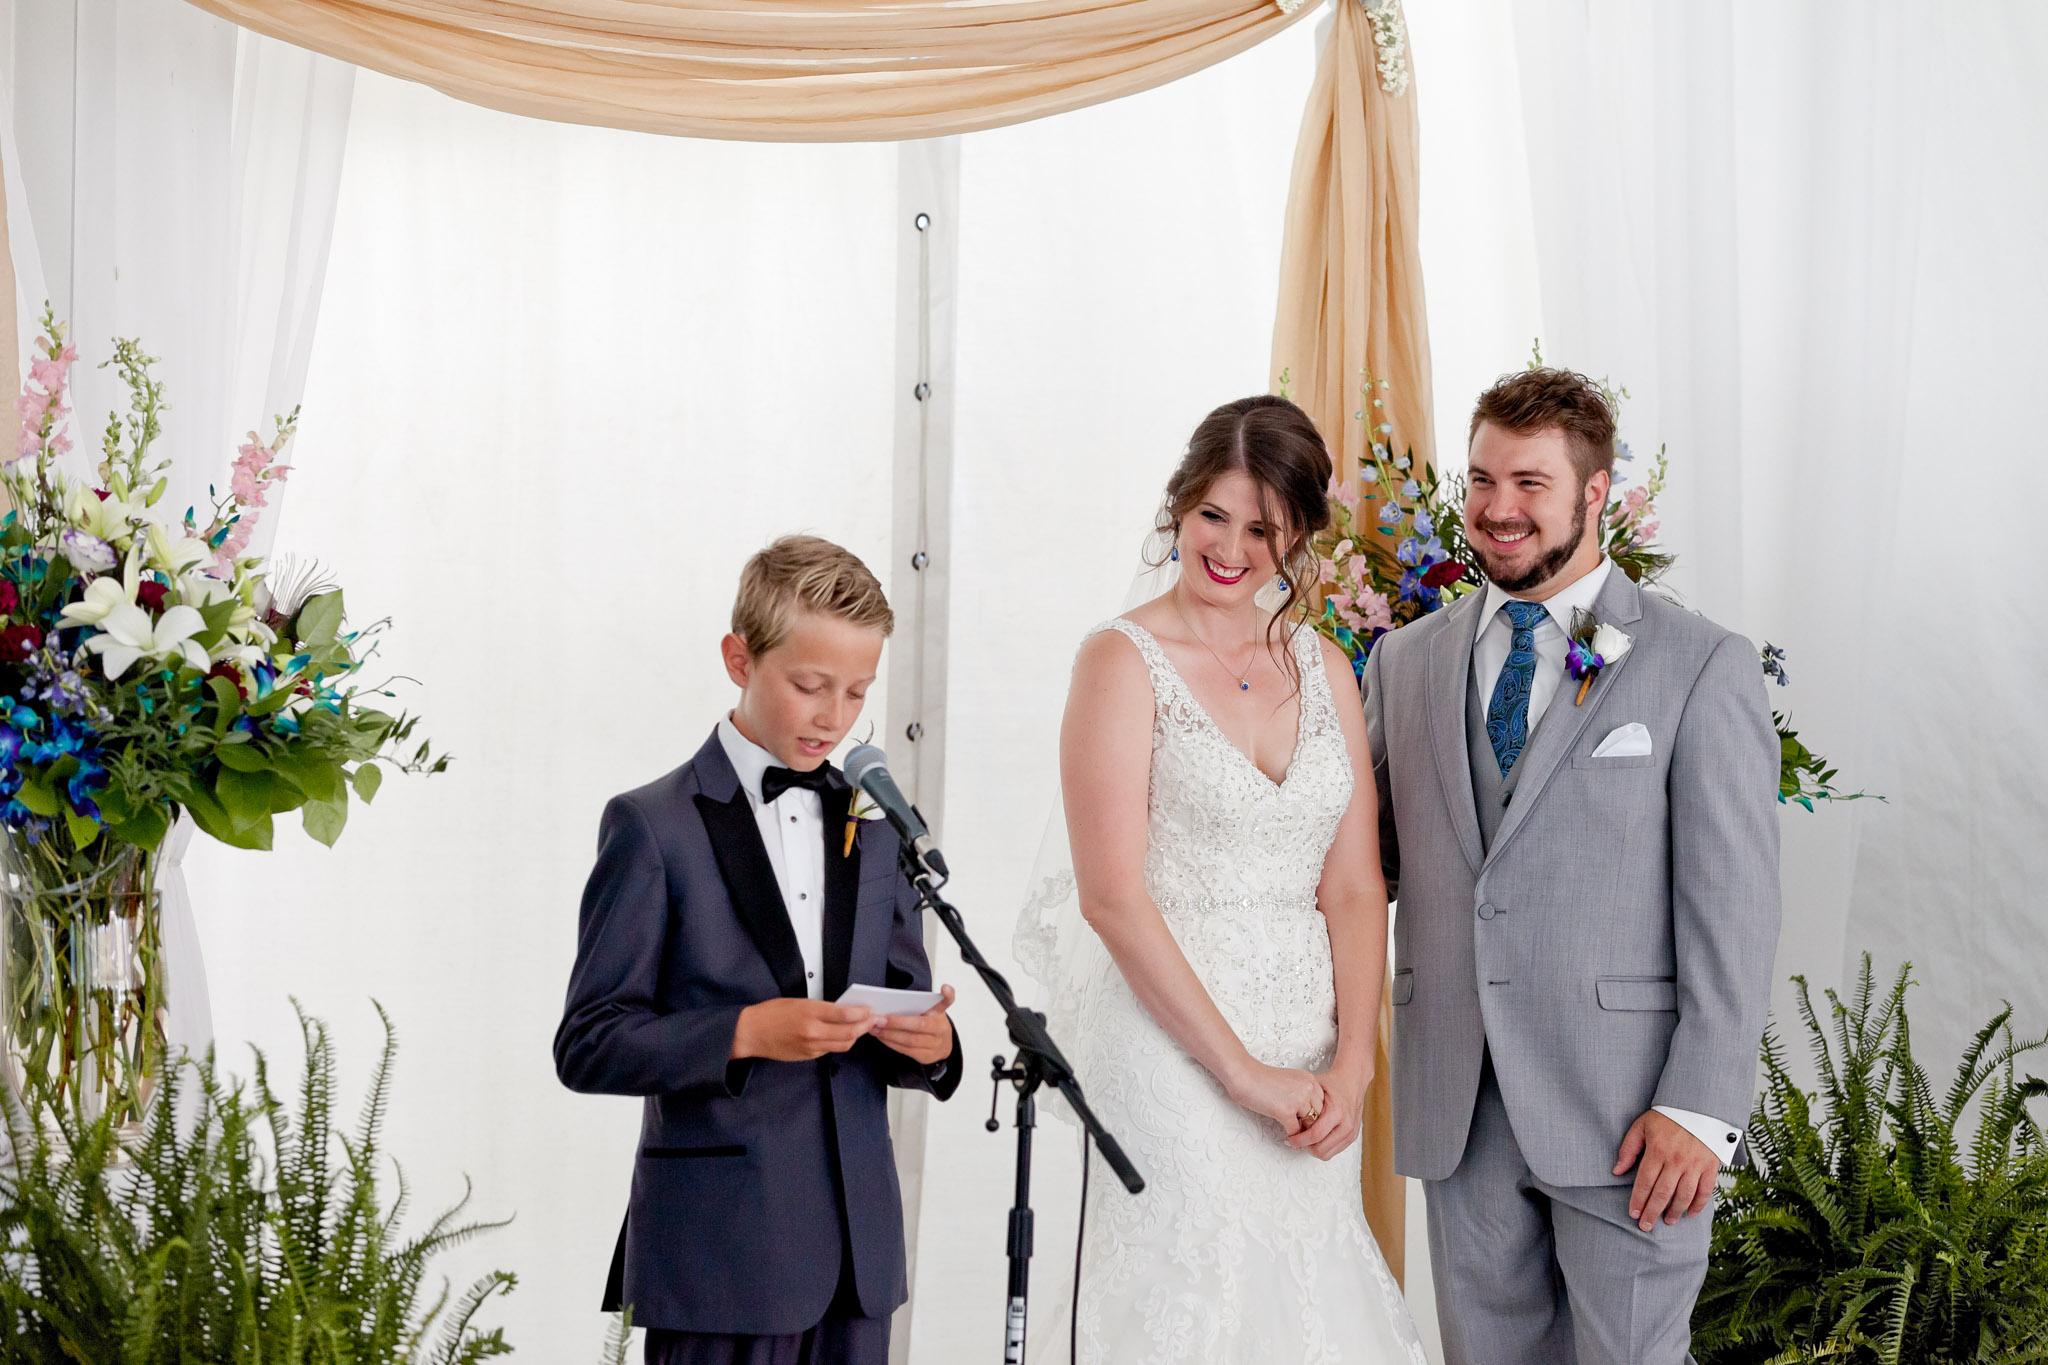 Brookstreet Hotel weddings #ottawa #wedding  #photographer-9256.jpg